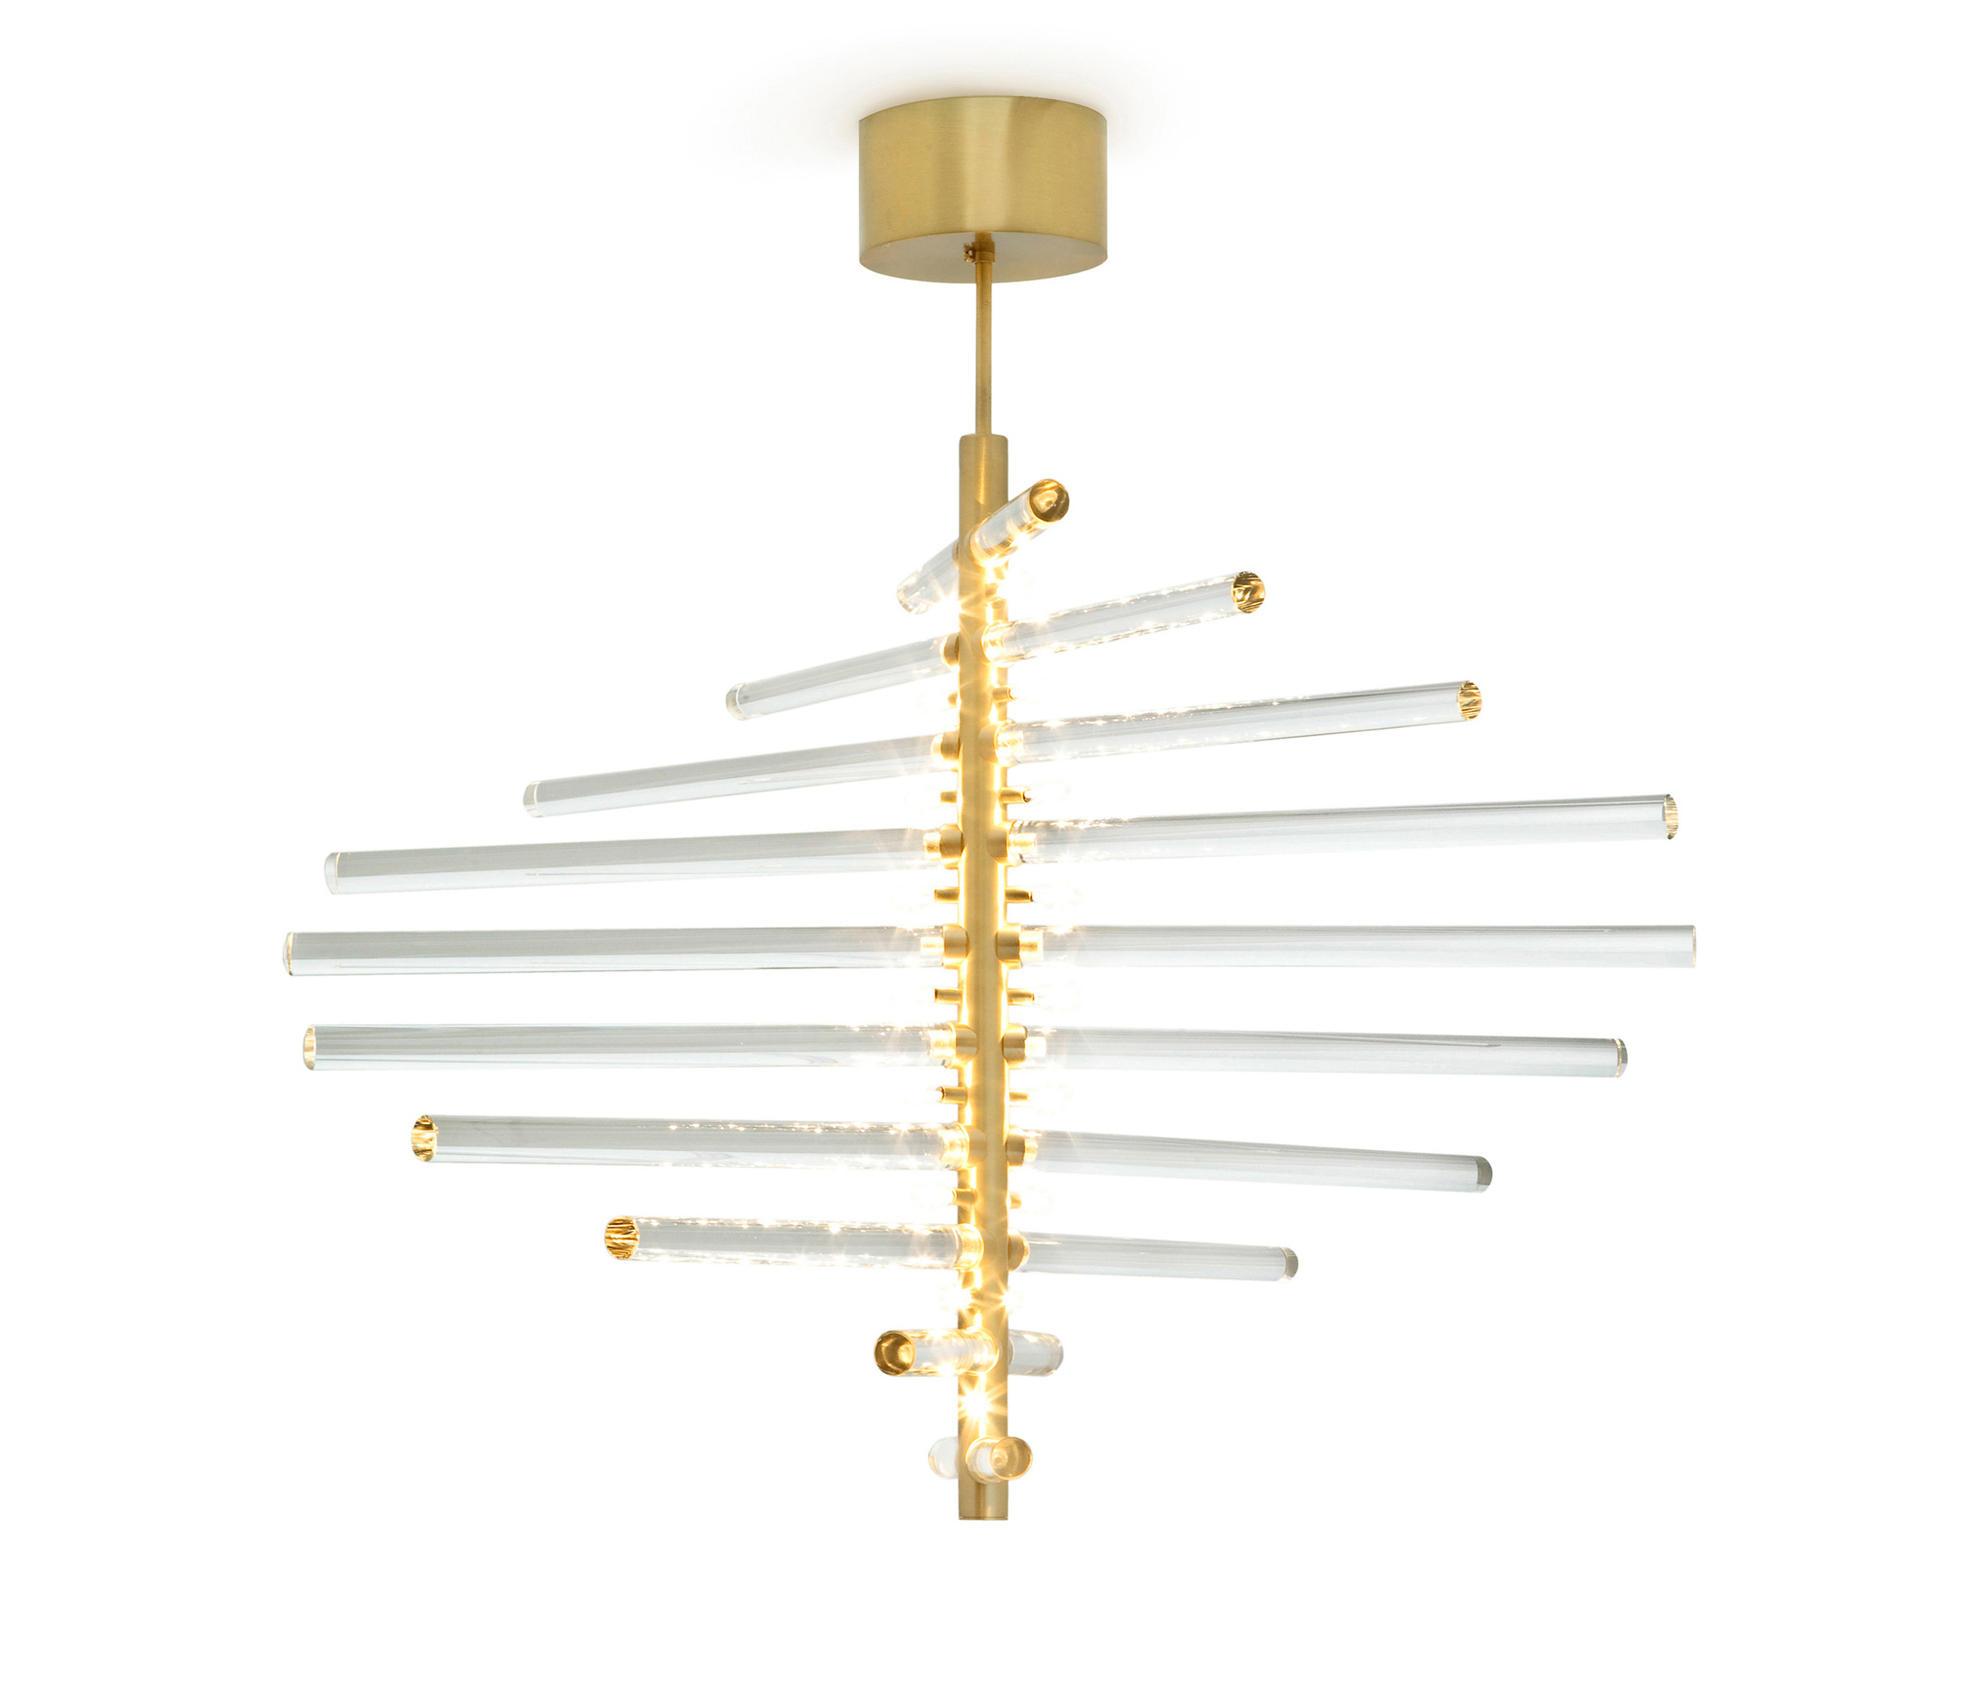 Eos chandelier general lighting from baroncelli architonic eos chandelier by baroncelli general lighting arubaitofo Images